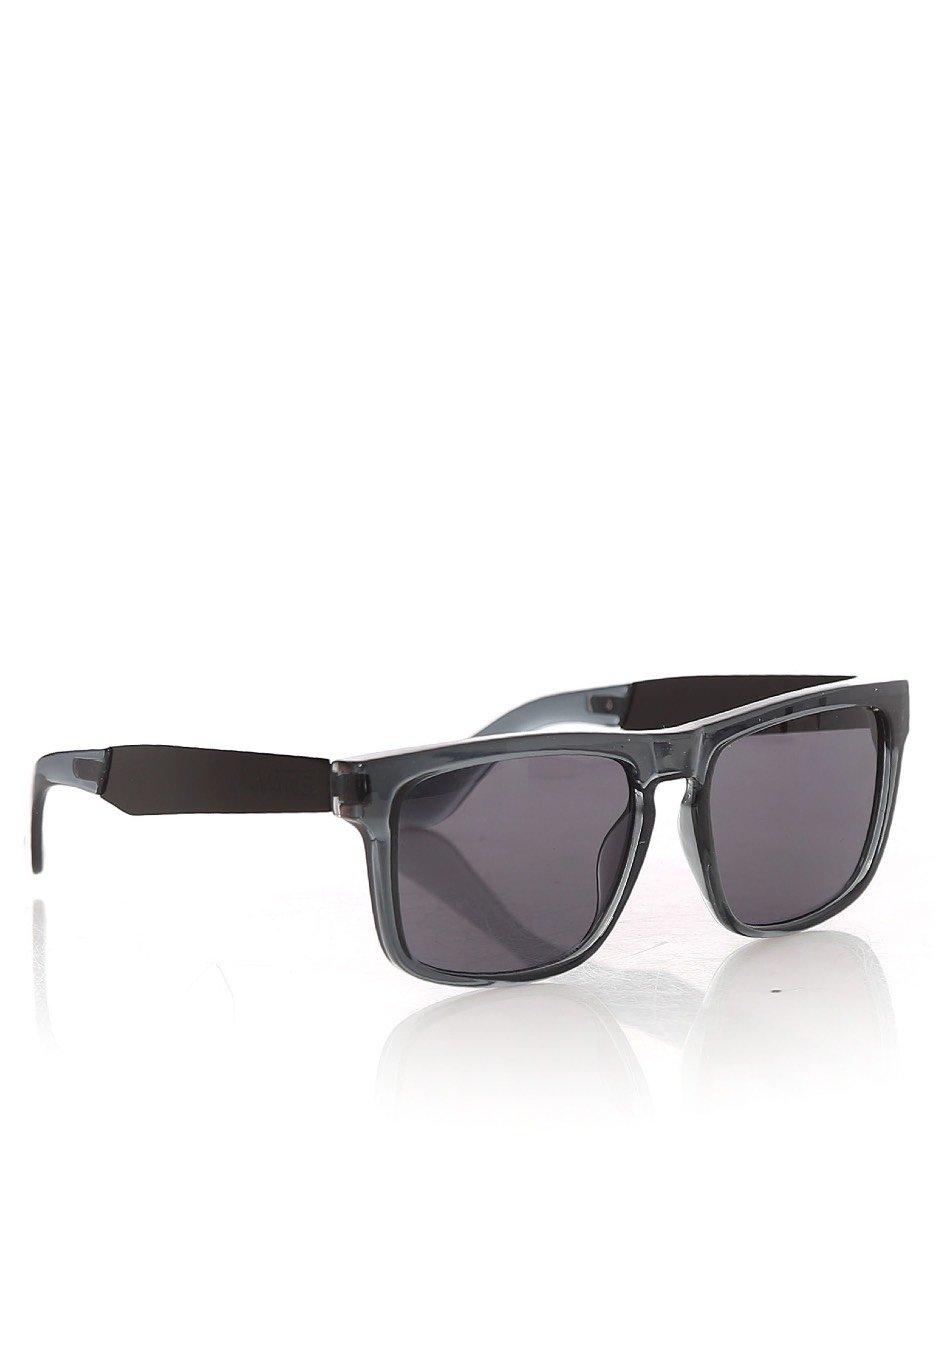 206f97ef1e7f1 Vans - Squared Off Shades Dark Slate - Sunglasses - Impericon.com UK